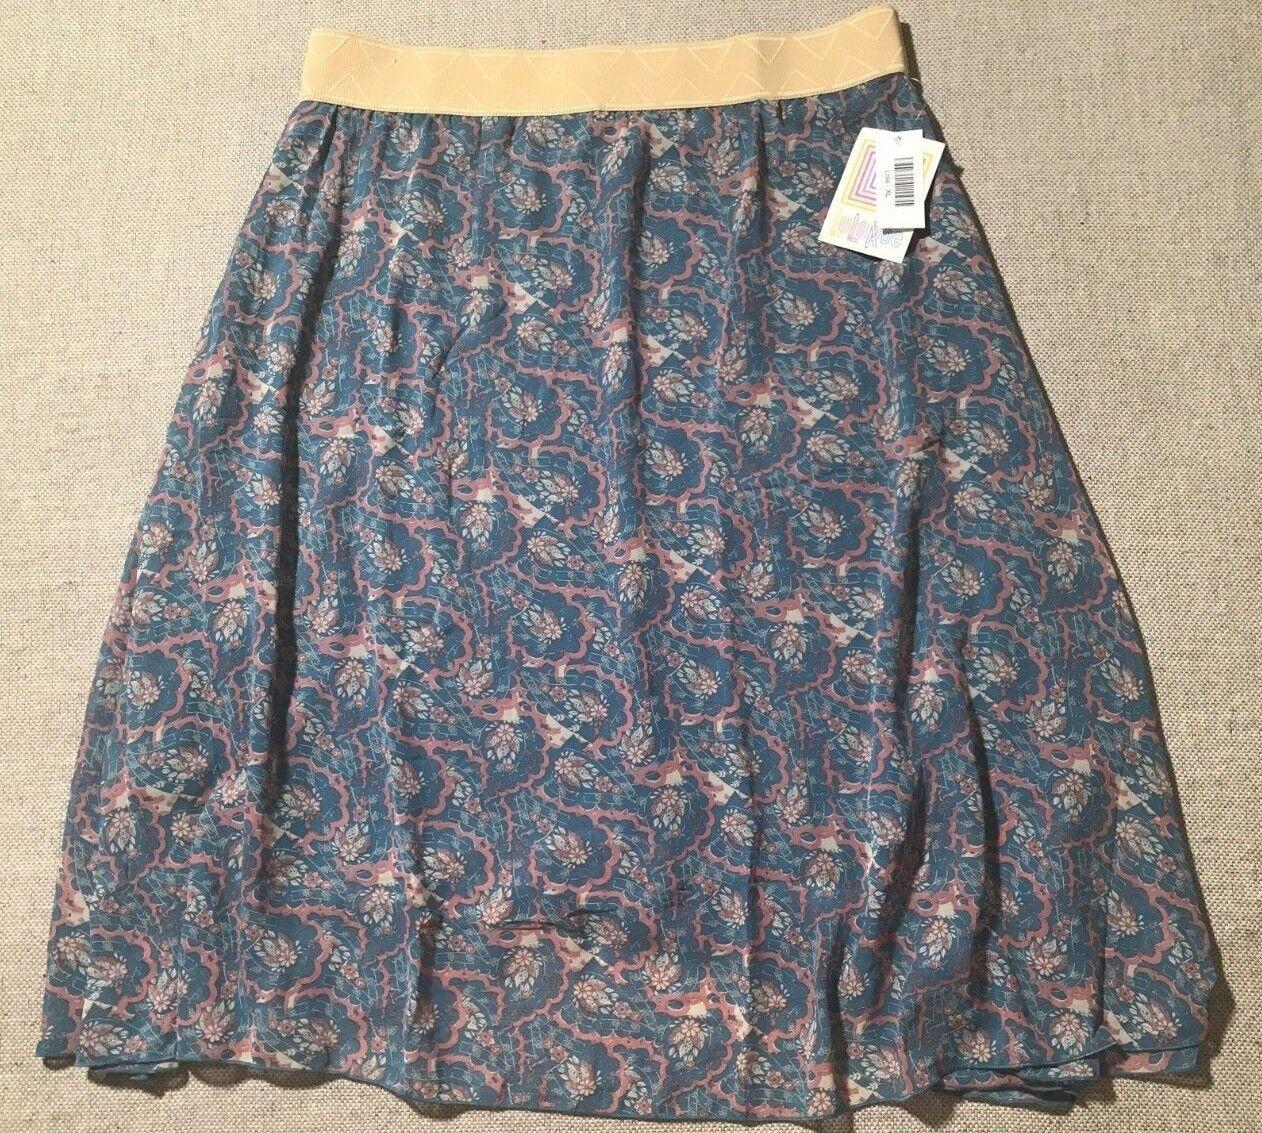 NEW LuLaRoe Lola Women's Print Flare Skirt Size XL  F2